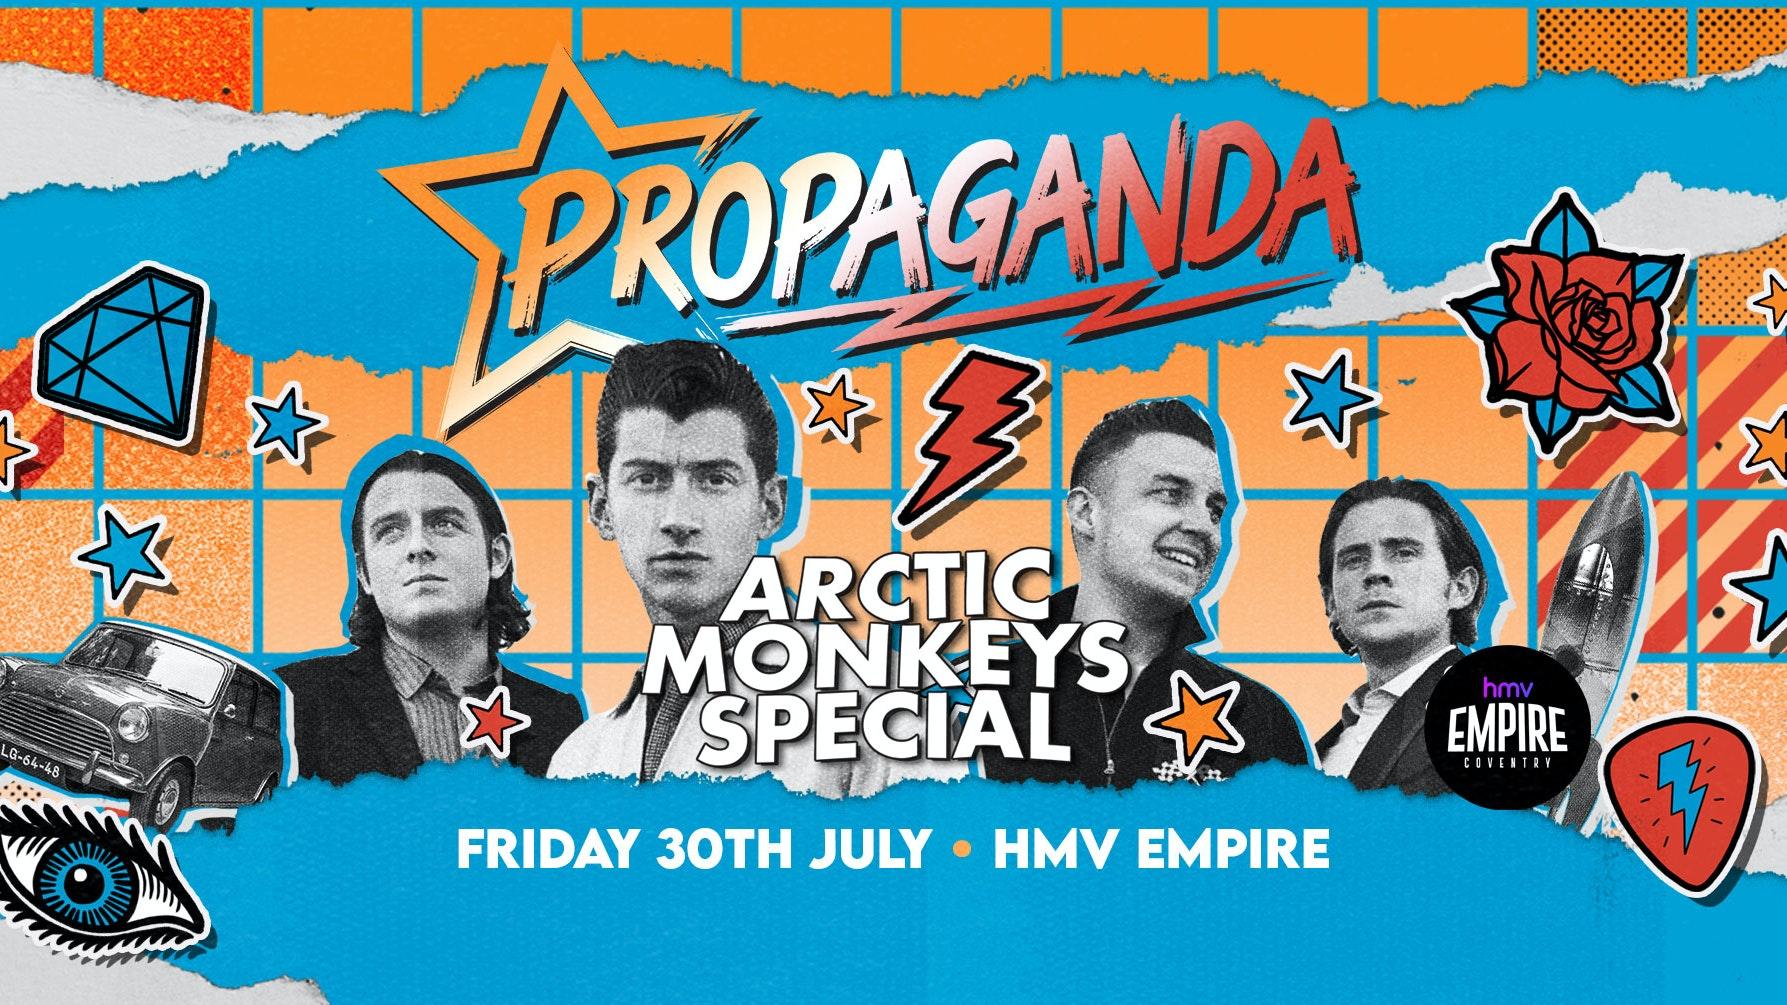 Propaganda Coventry – Arctic Monkey's Special